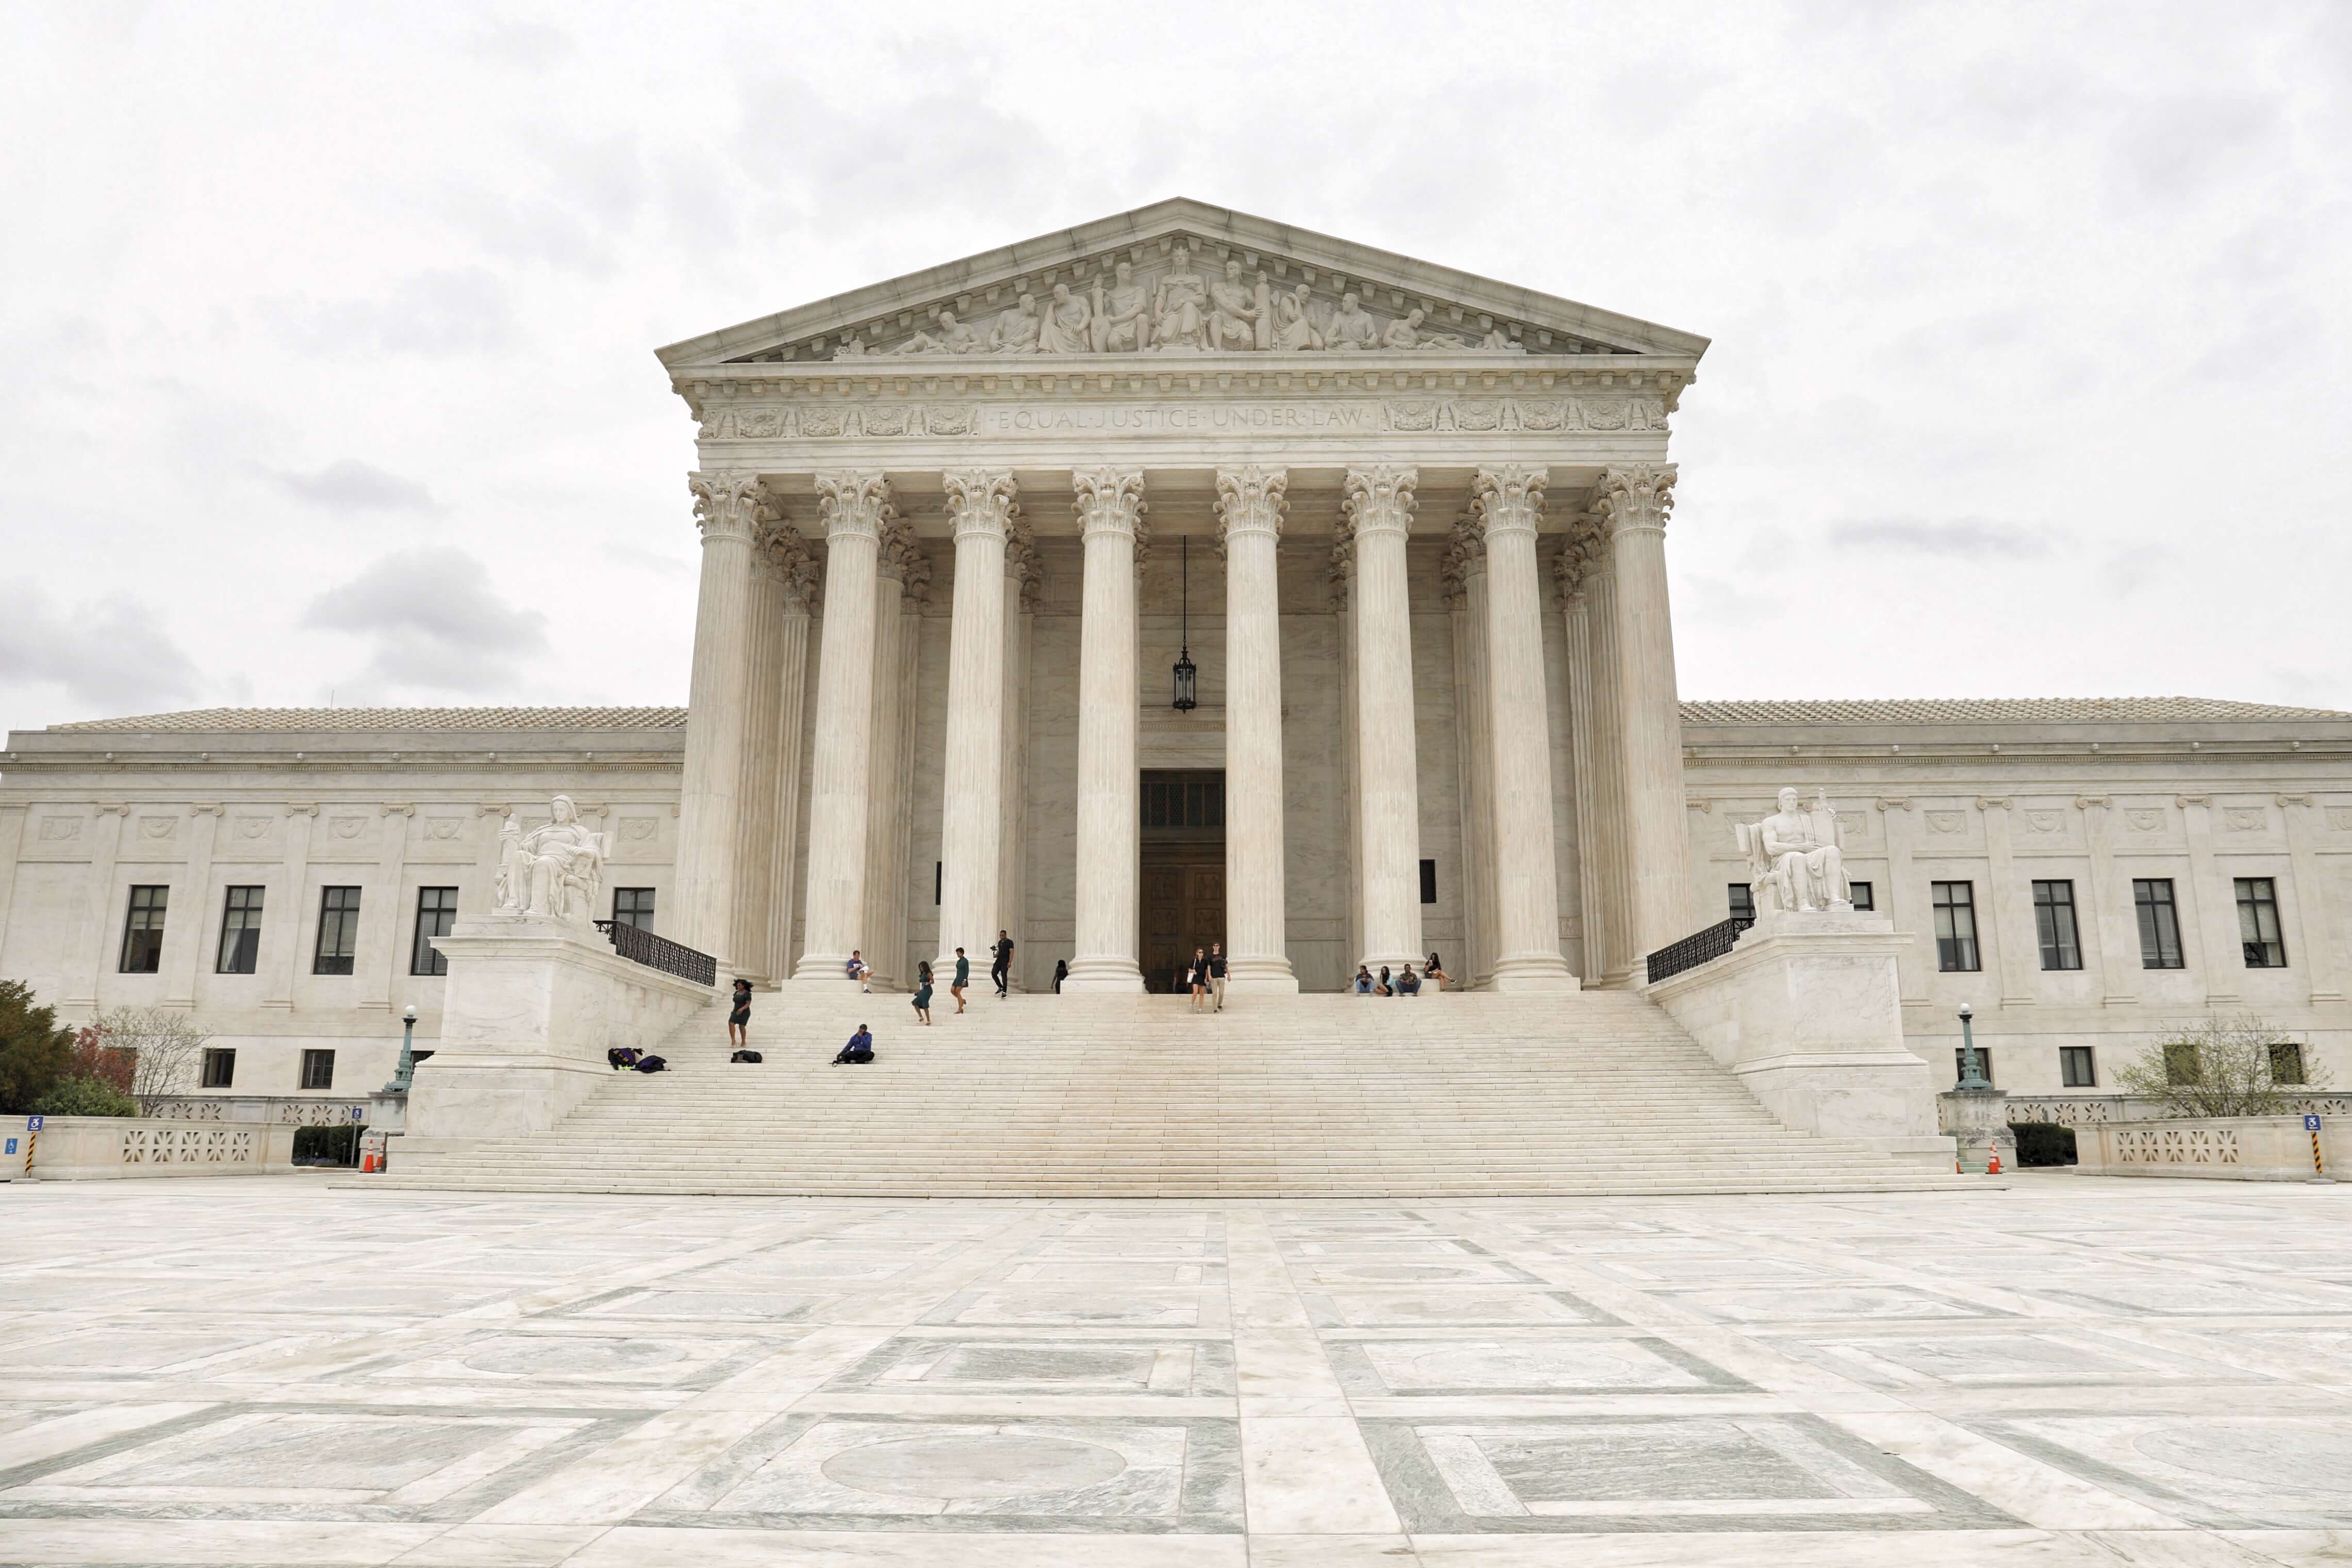 Image of U.S. Supreme Court.